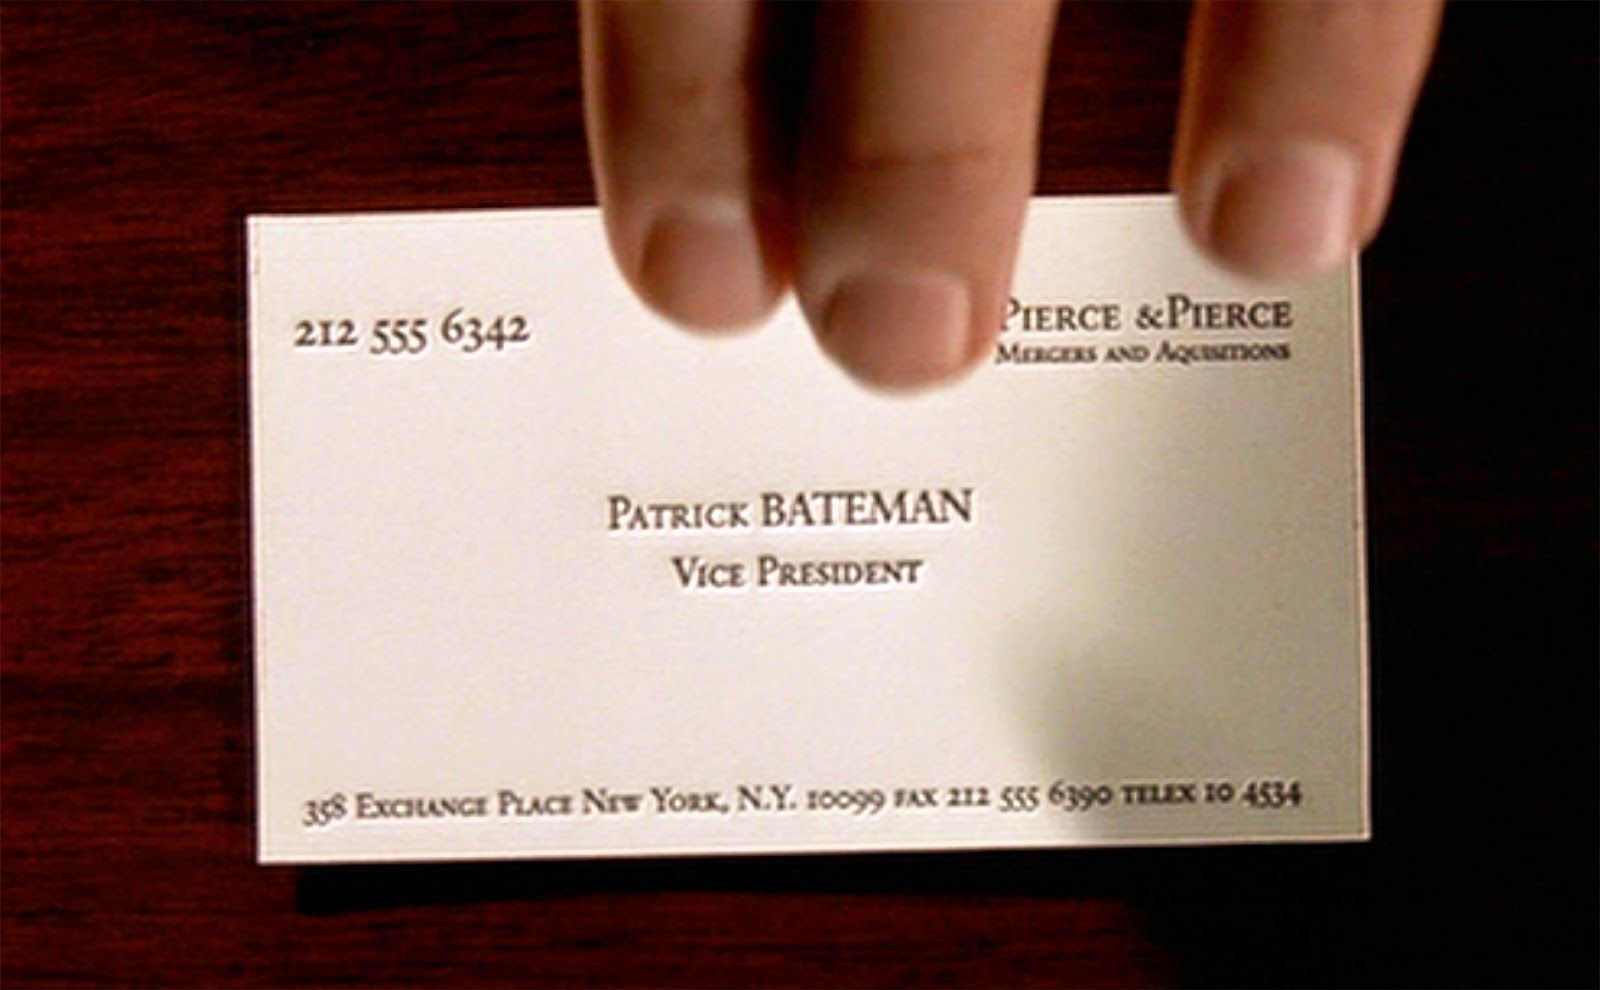 AmericanPsychoPatrickBatemanBusinessCardPicturejpg - American psycho business card template